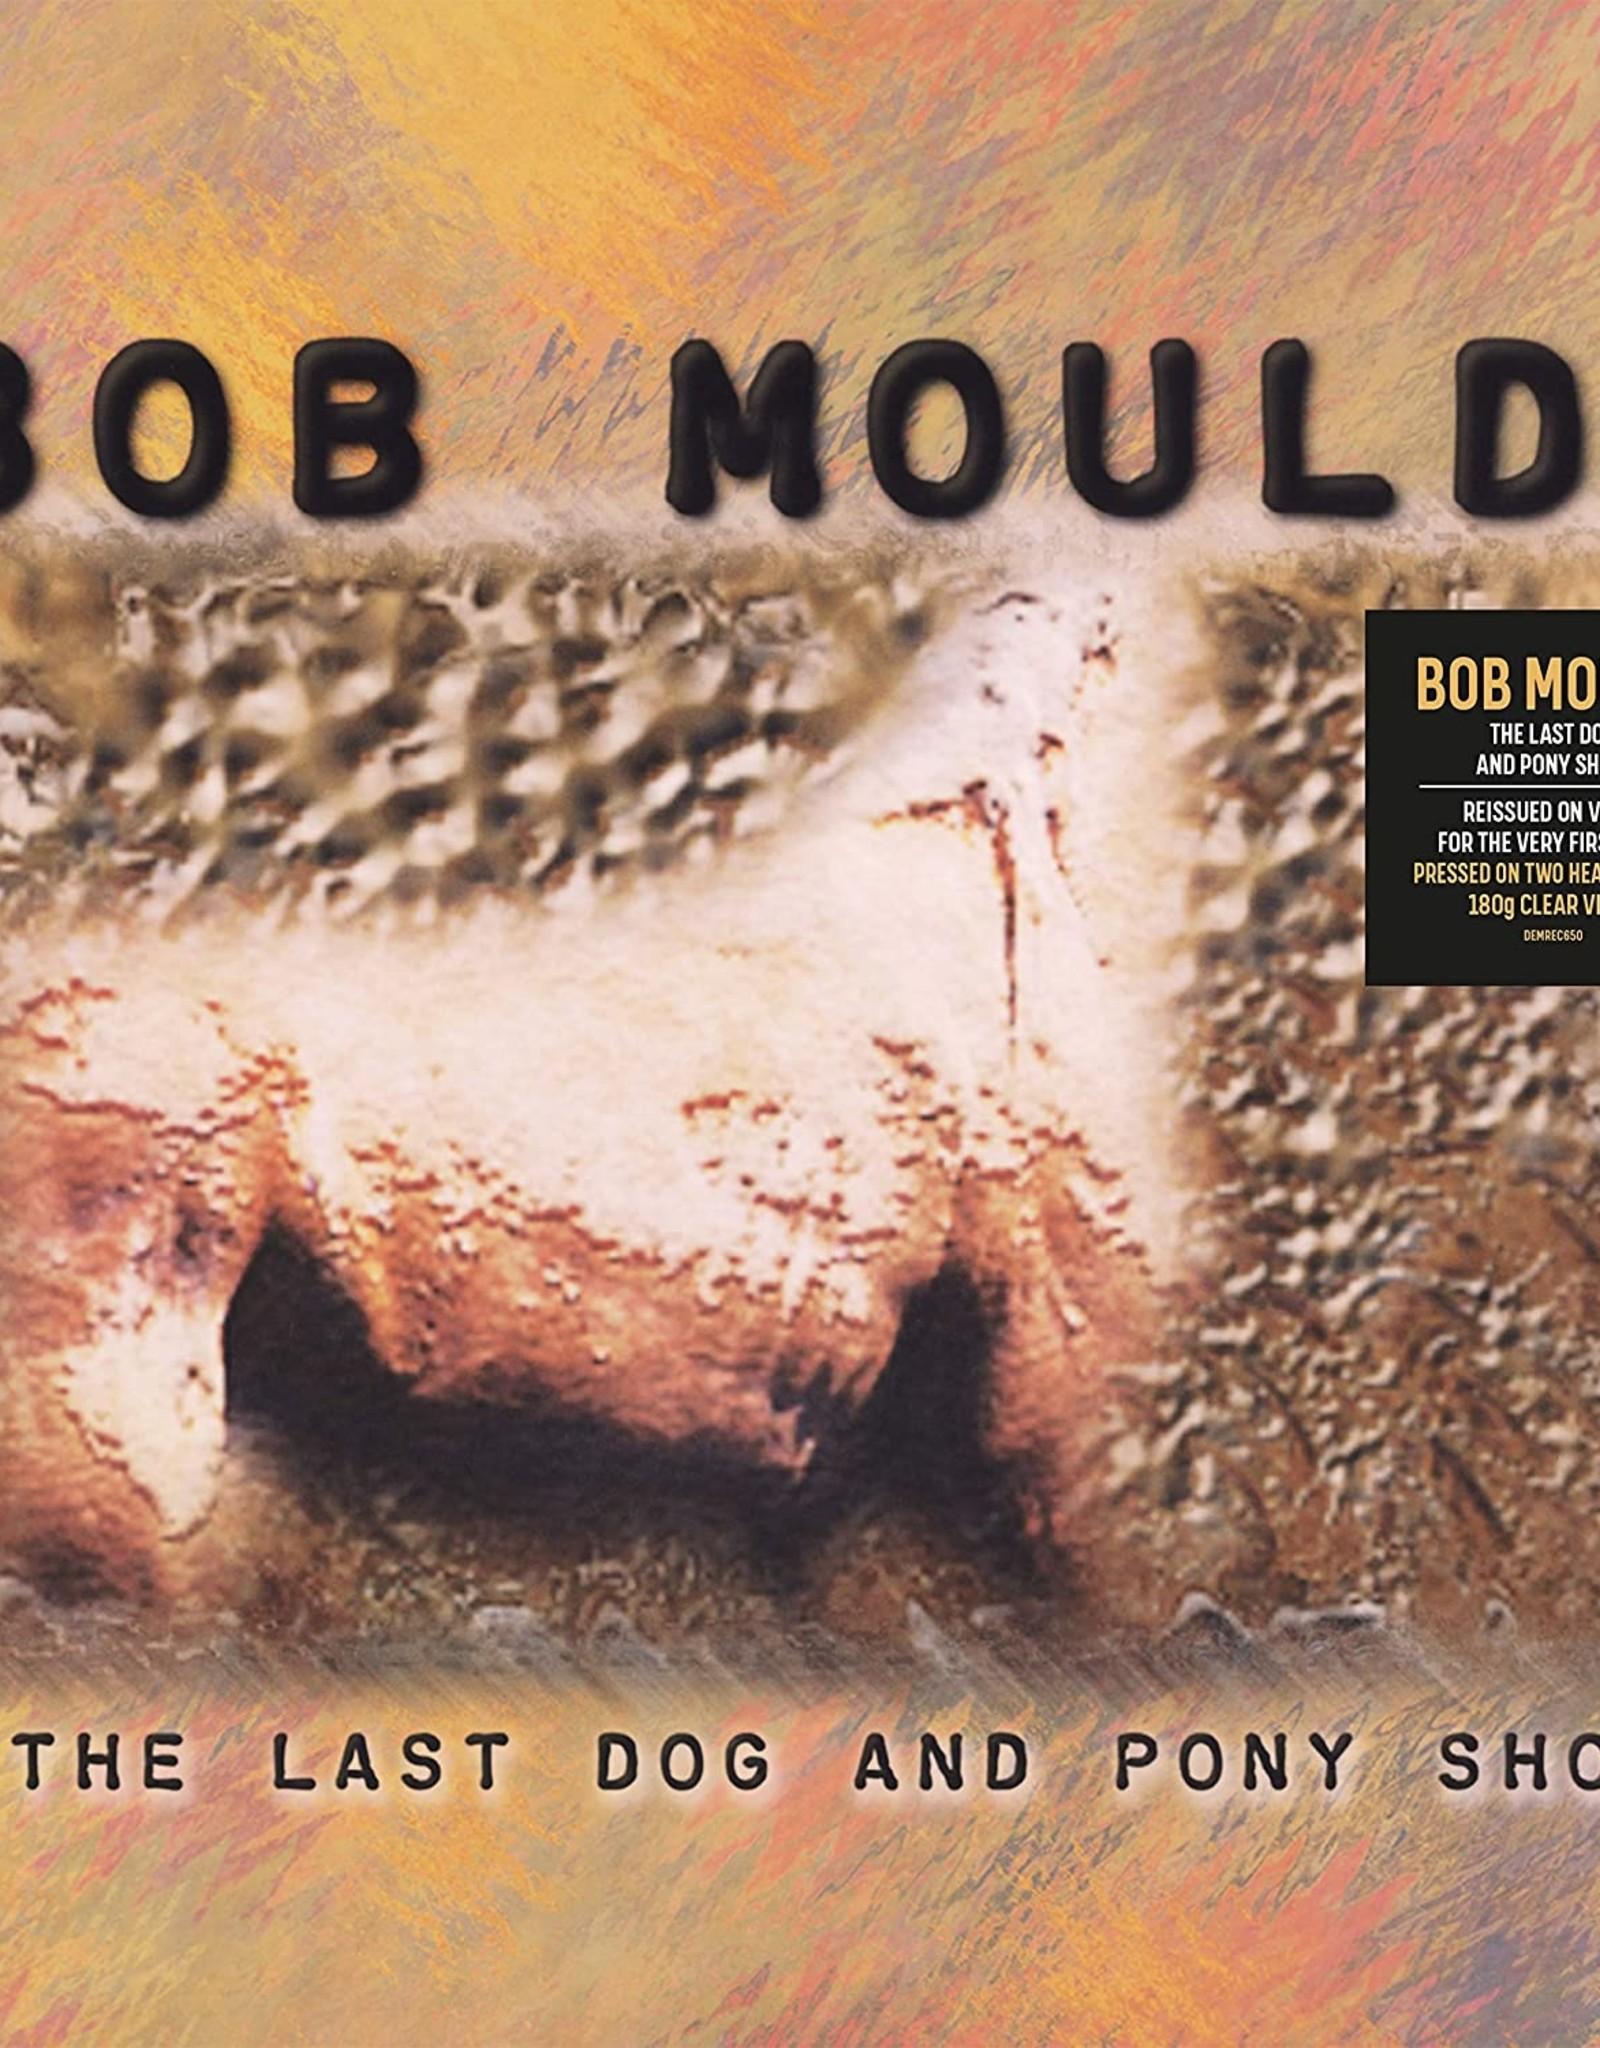 Bob Mould - Last Dog & Pony Show (Heavyweight Clear Vinyl)